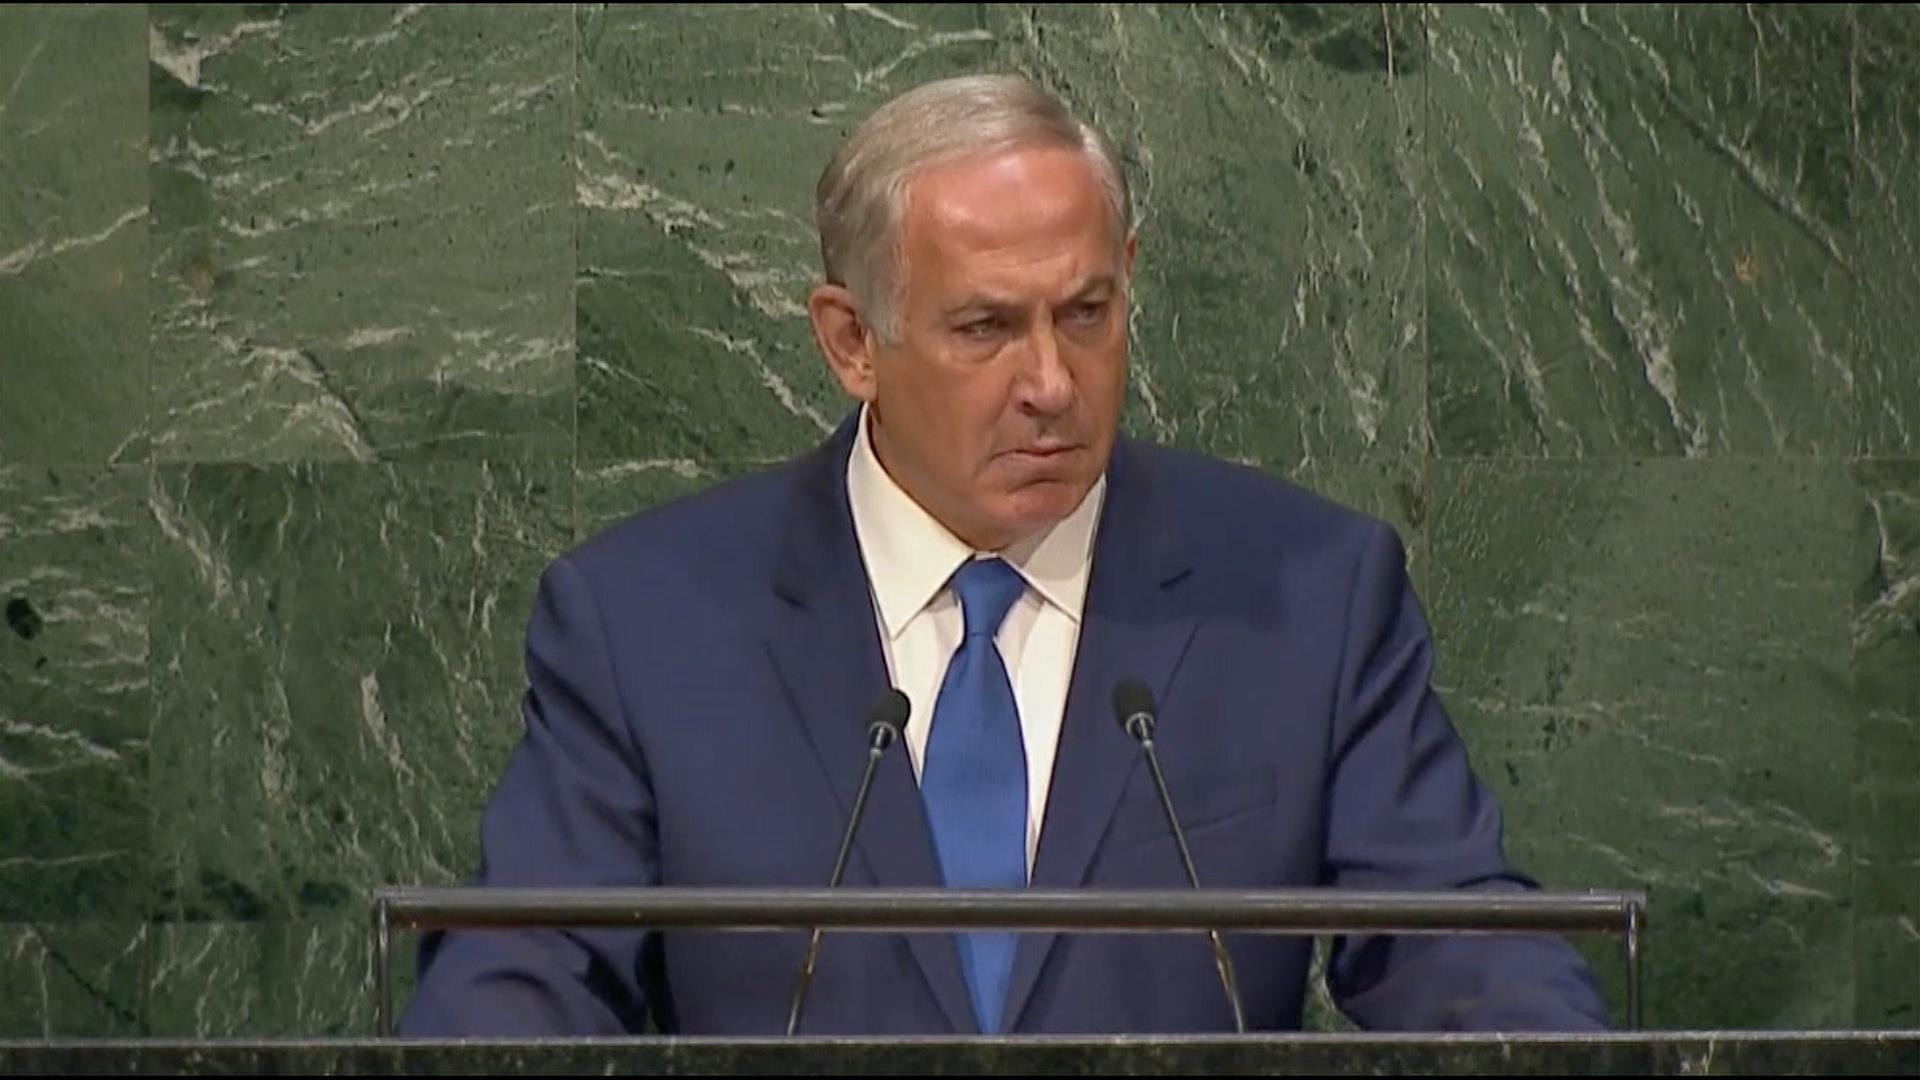 Netanyahu warns that Iran is building terrorist cells worldwide